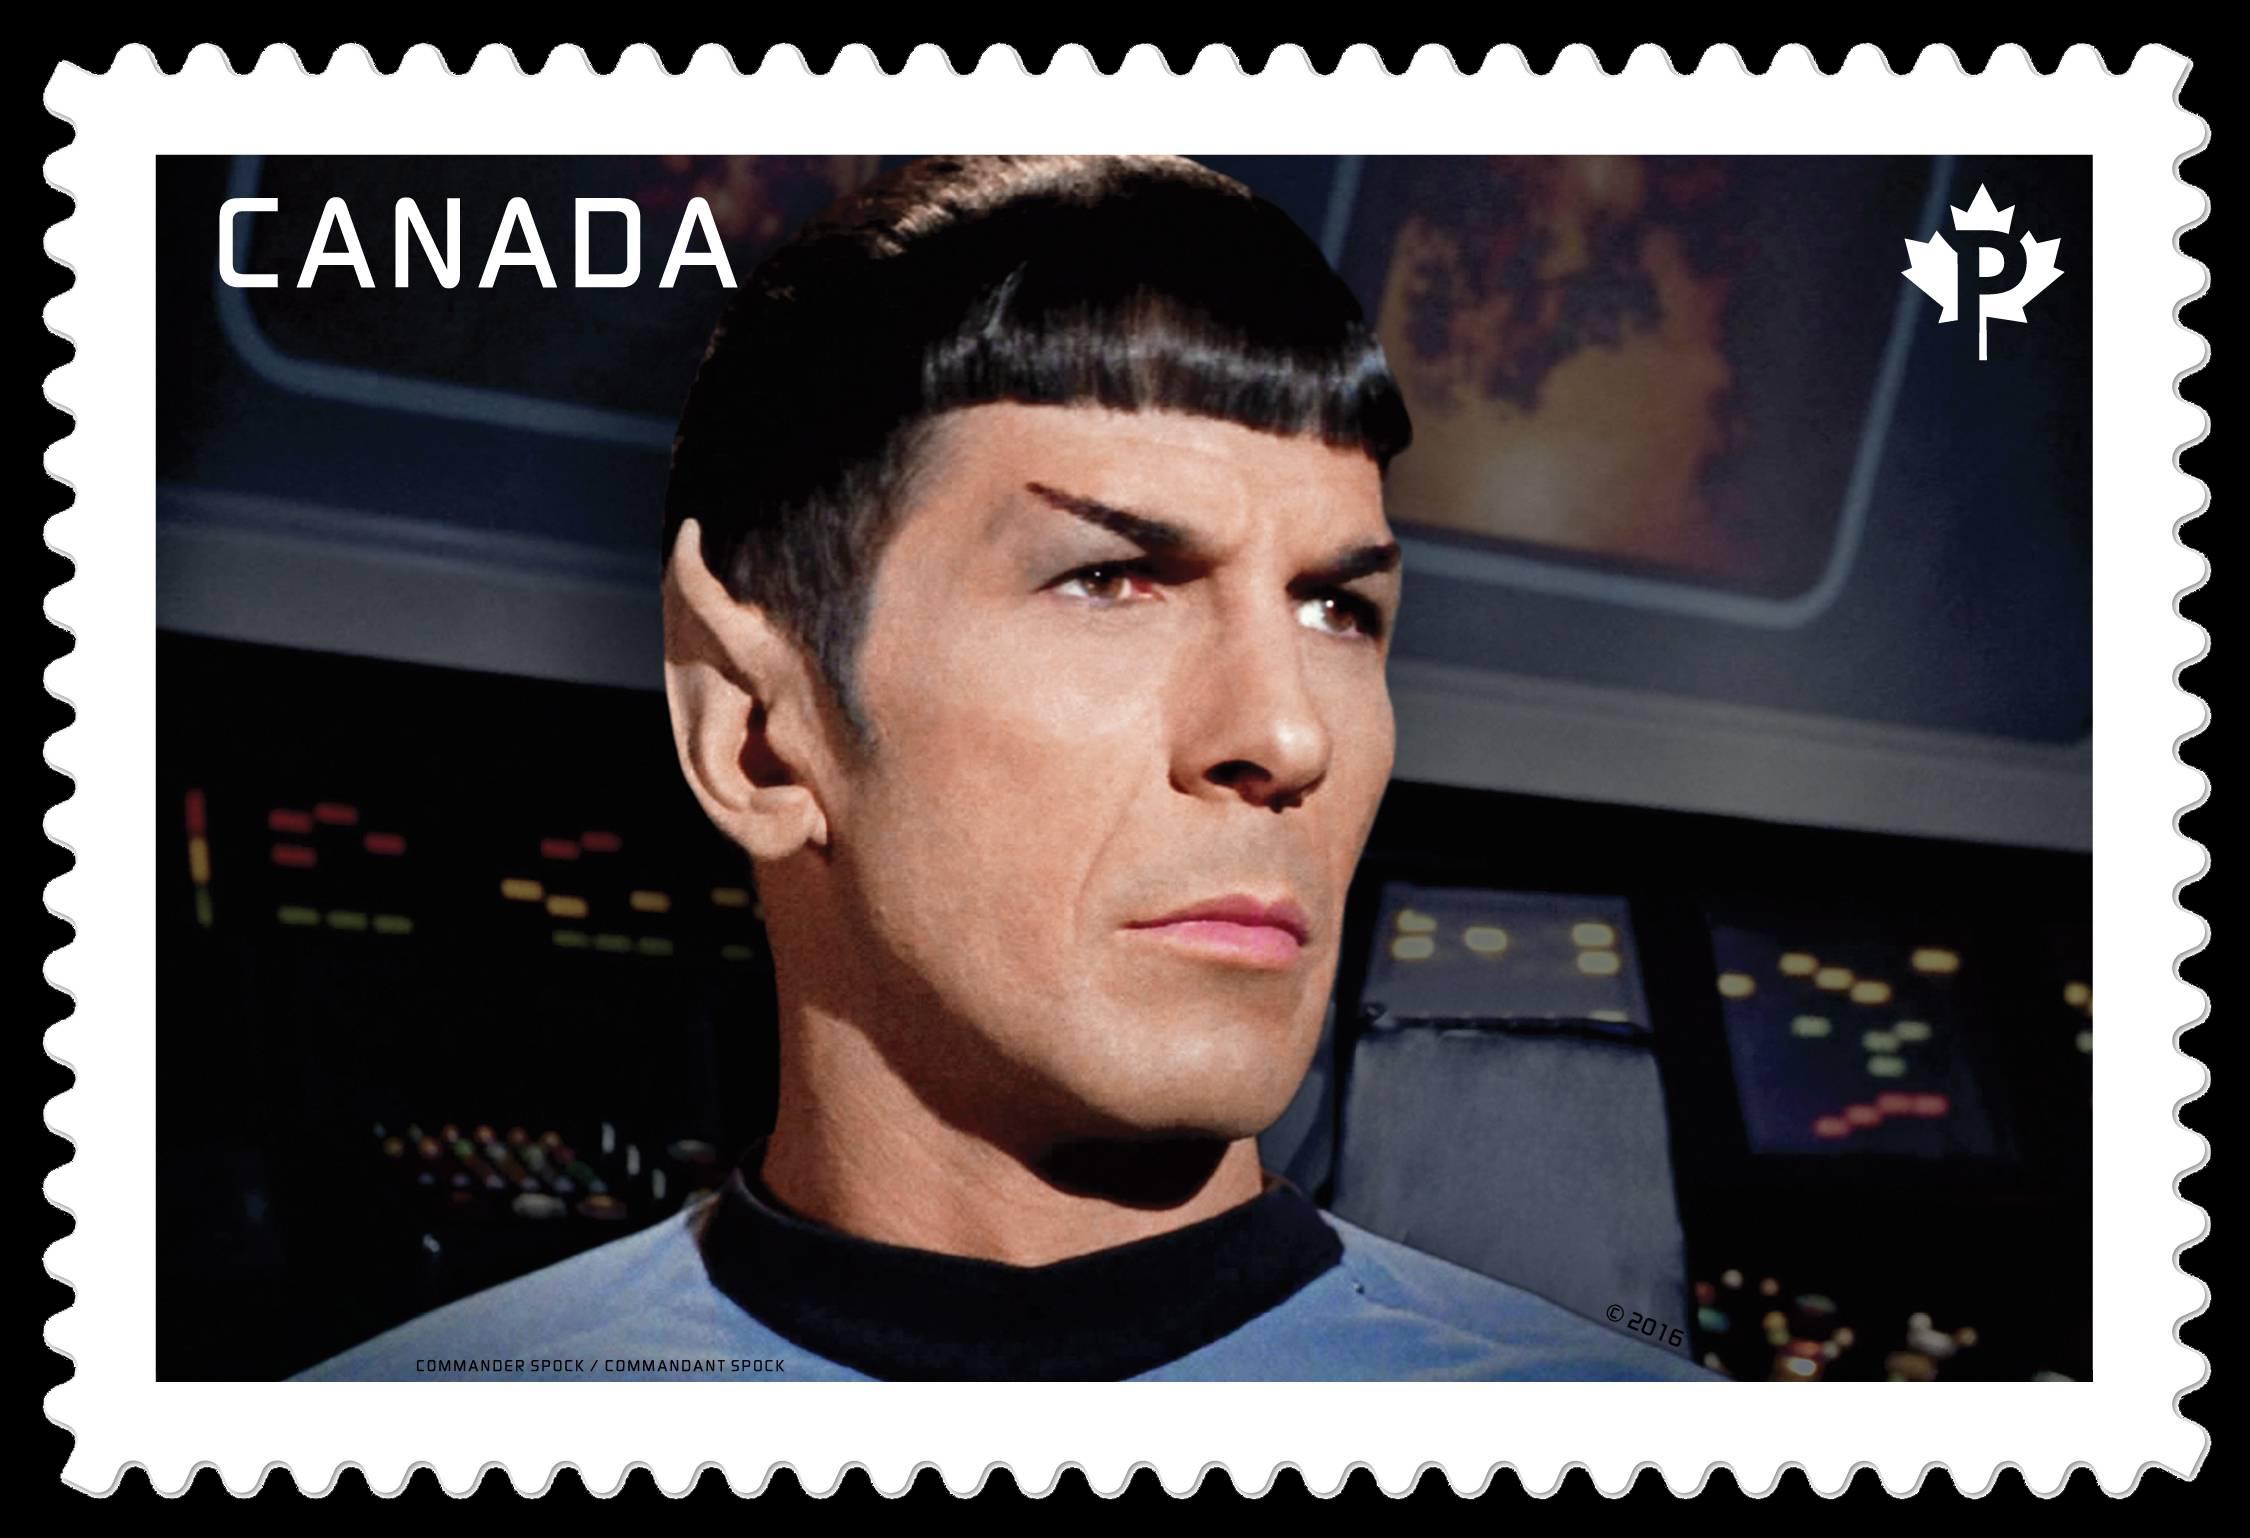 Commander Spock - Star Trek Canada Postage Stamp | Star Trek